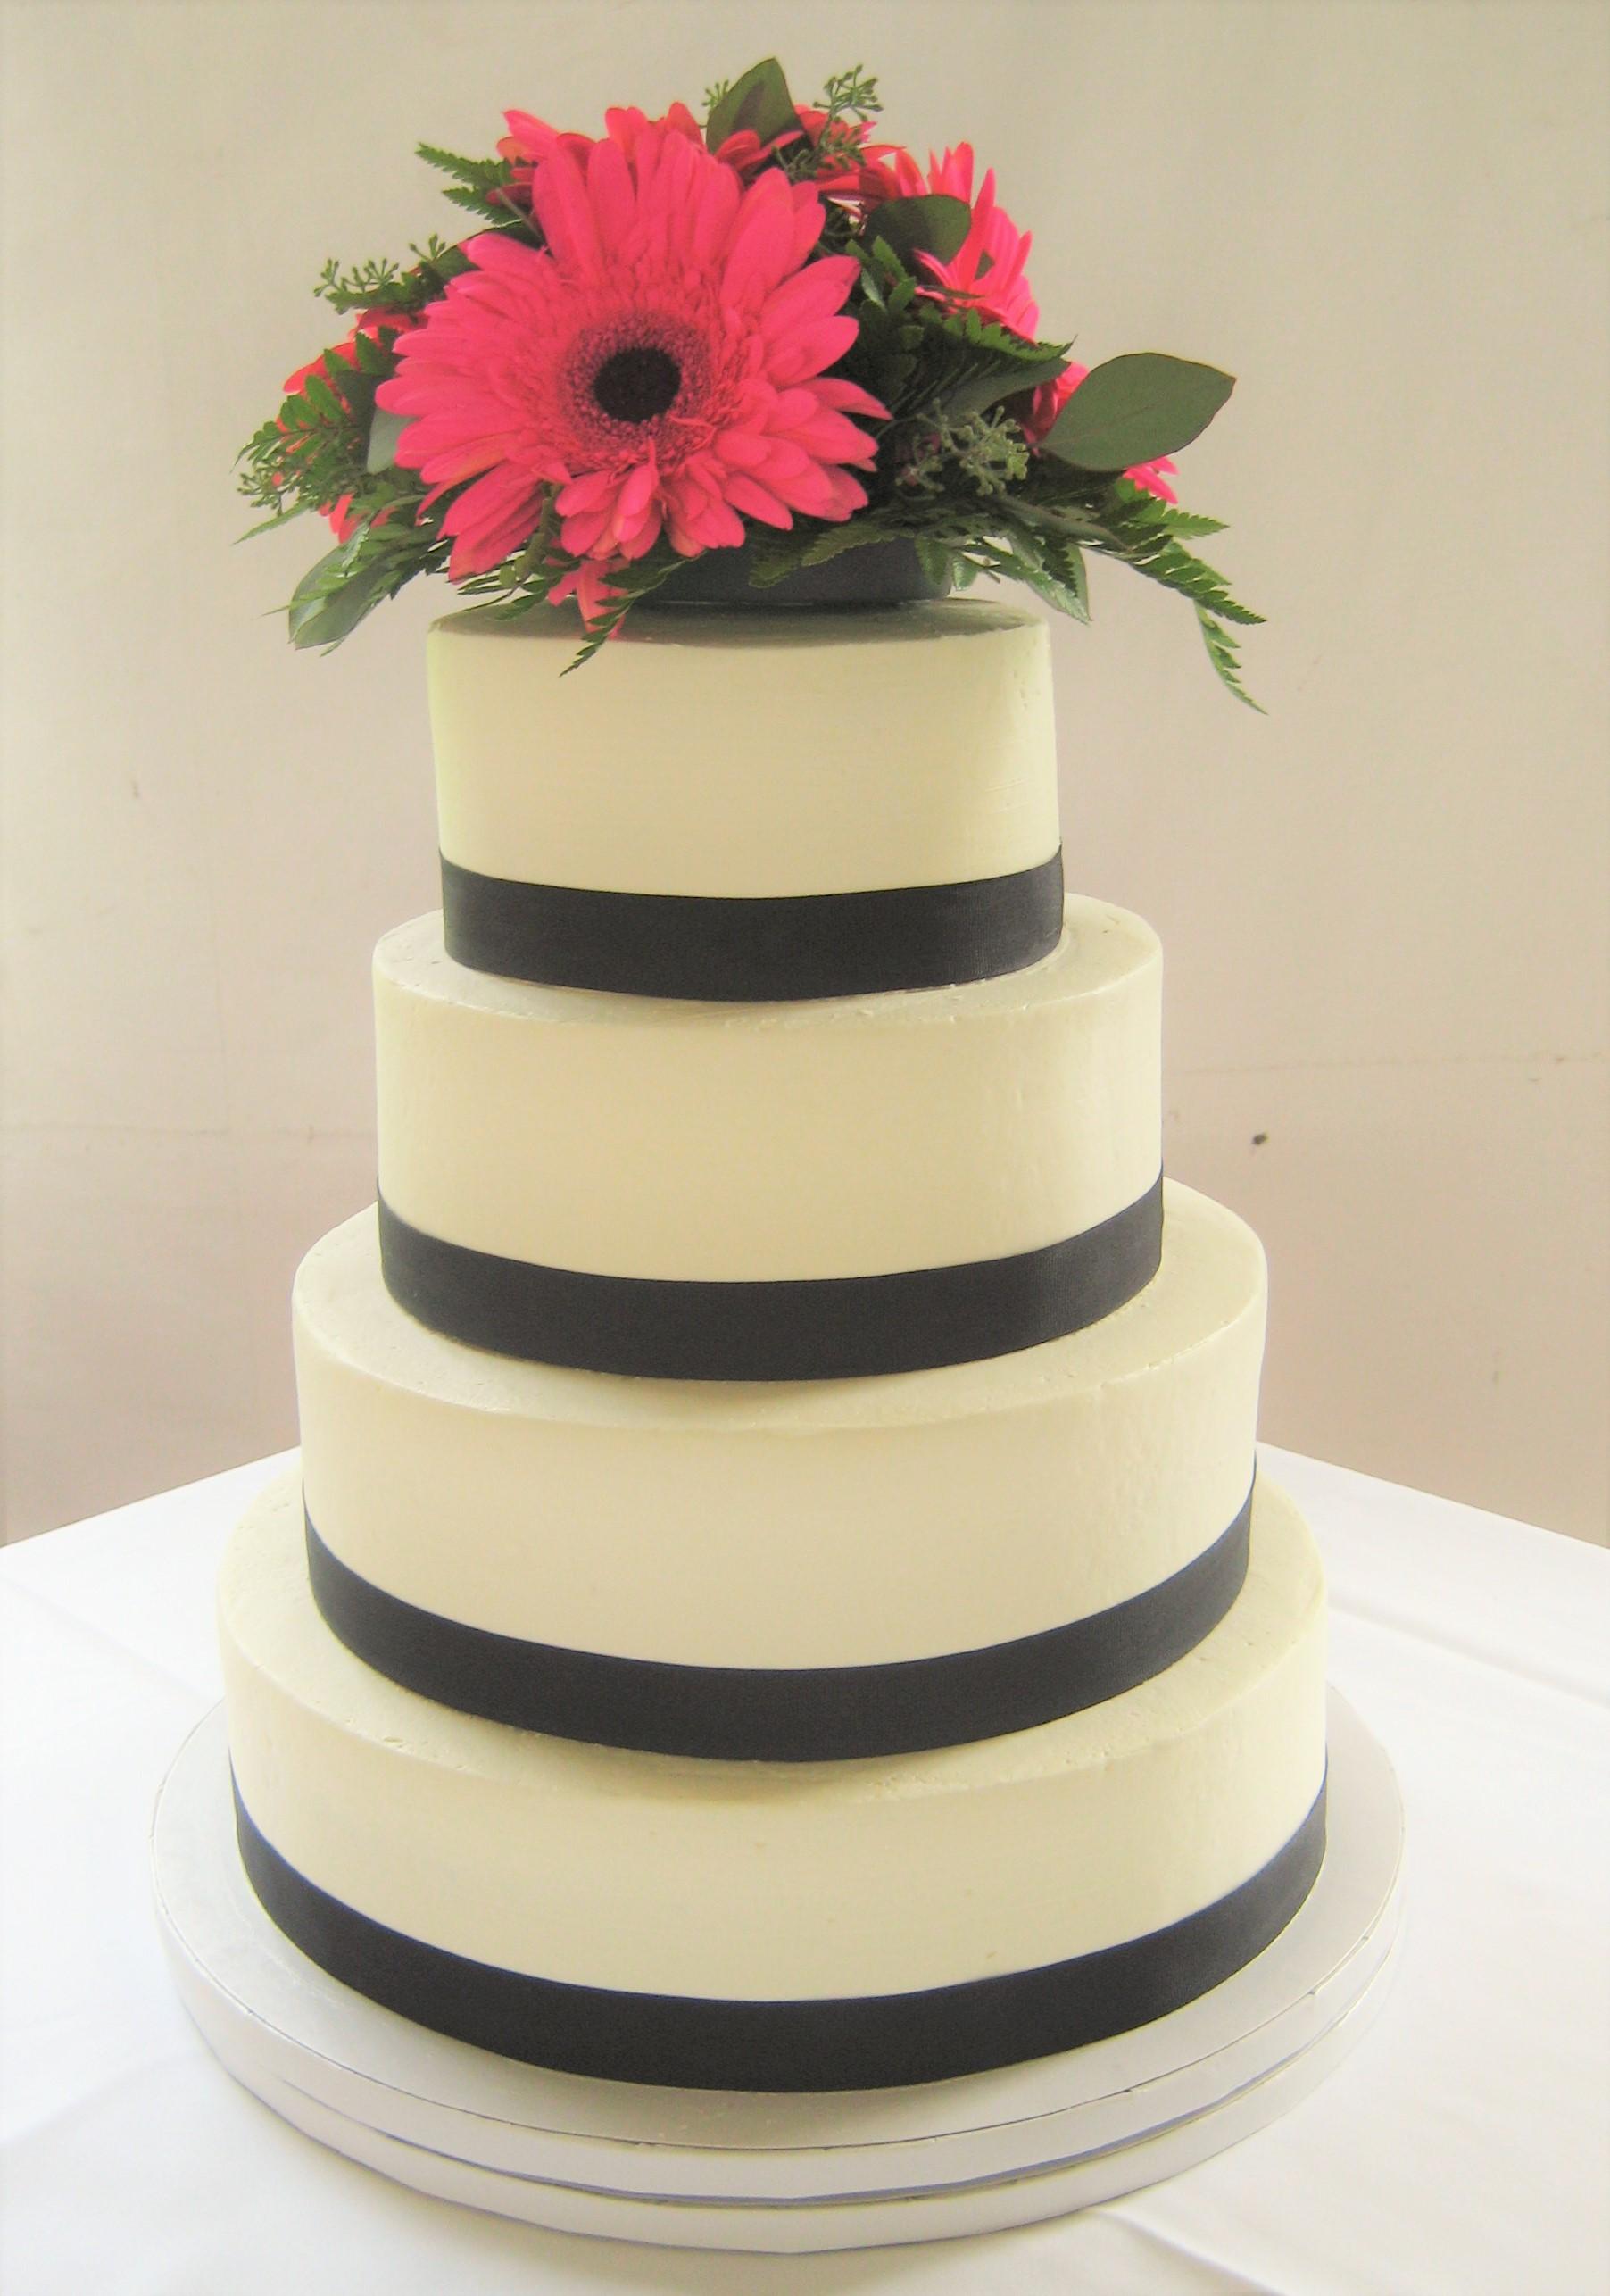 Cake Gallery Aunty Ellens - Bakery & Wedding Cakes Leominster MA